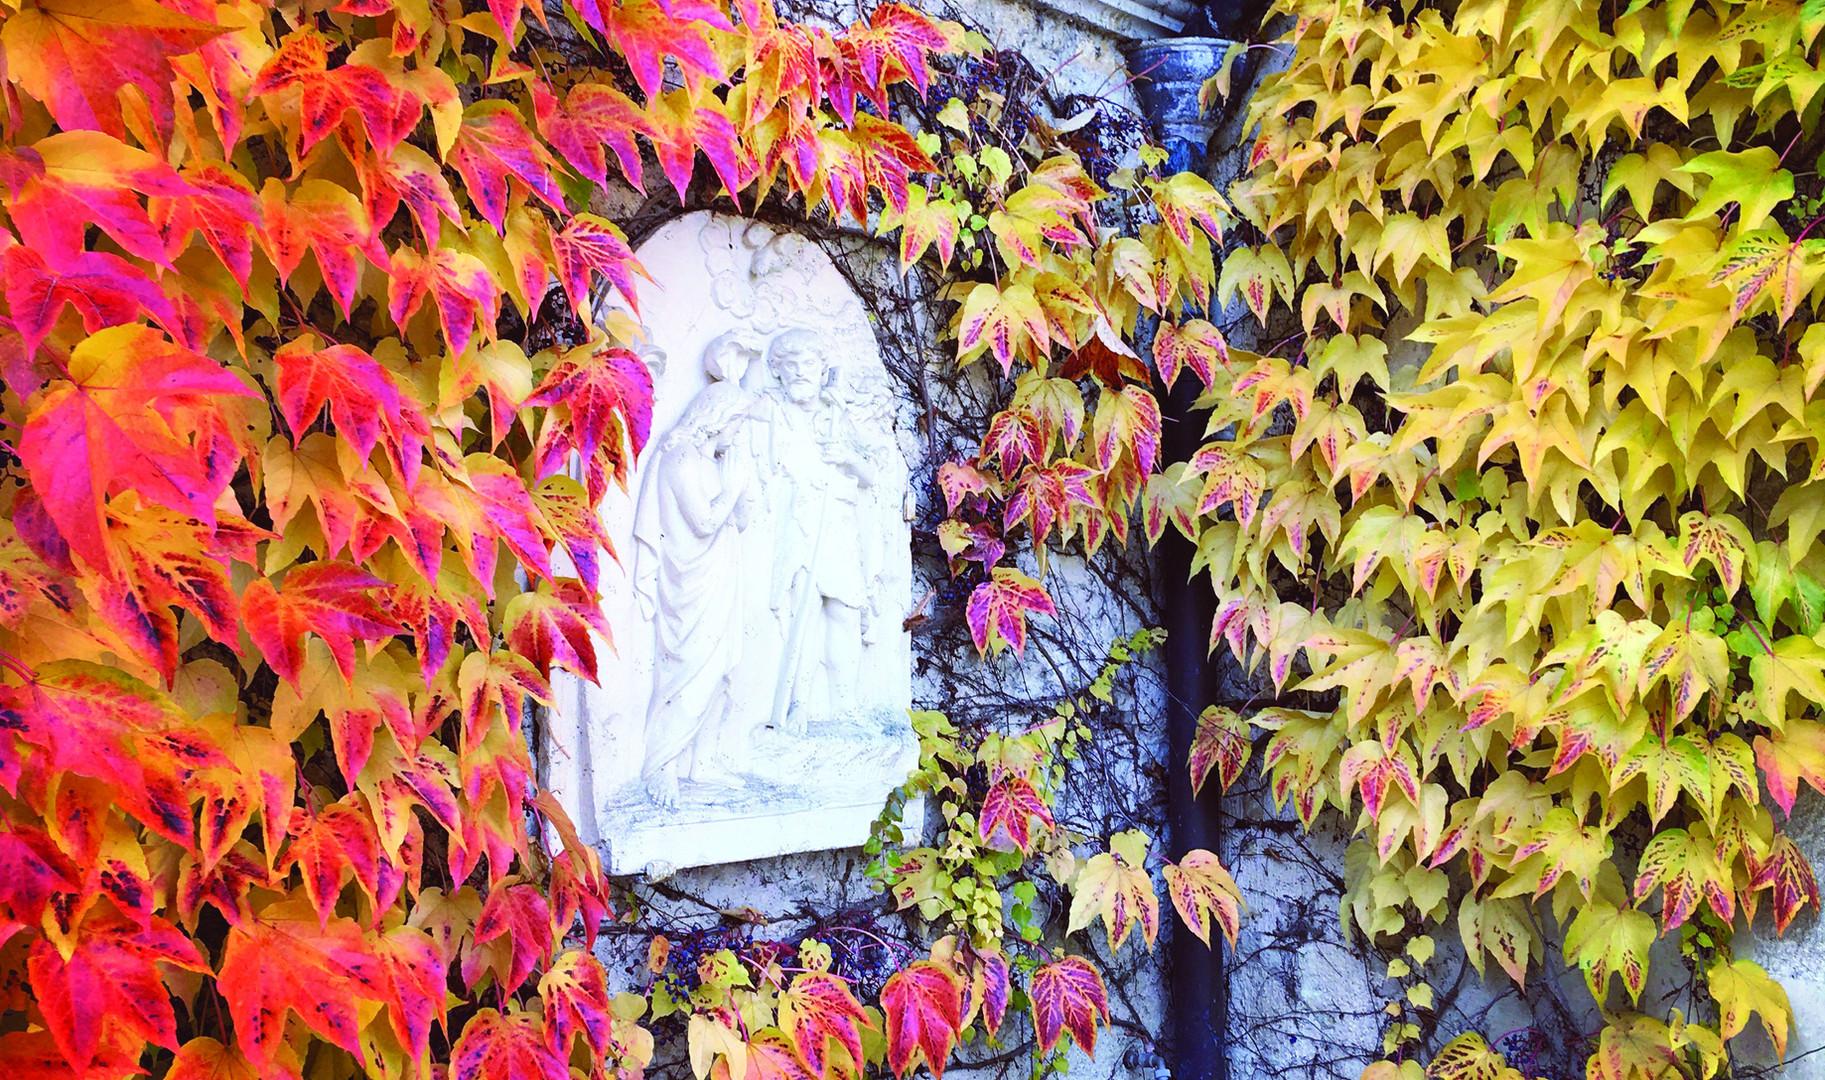 Feuilles de vigne en automne